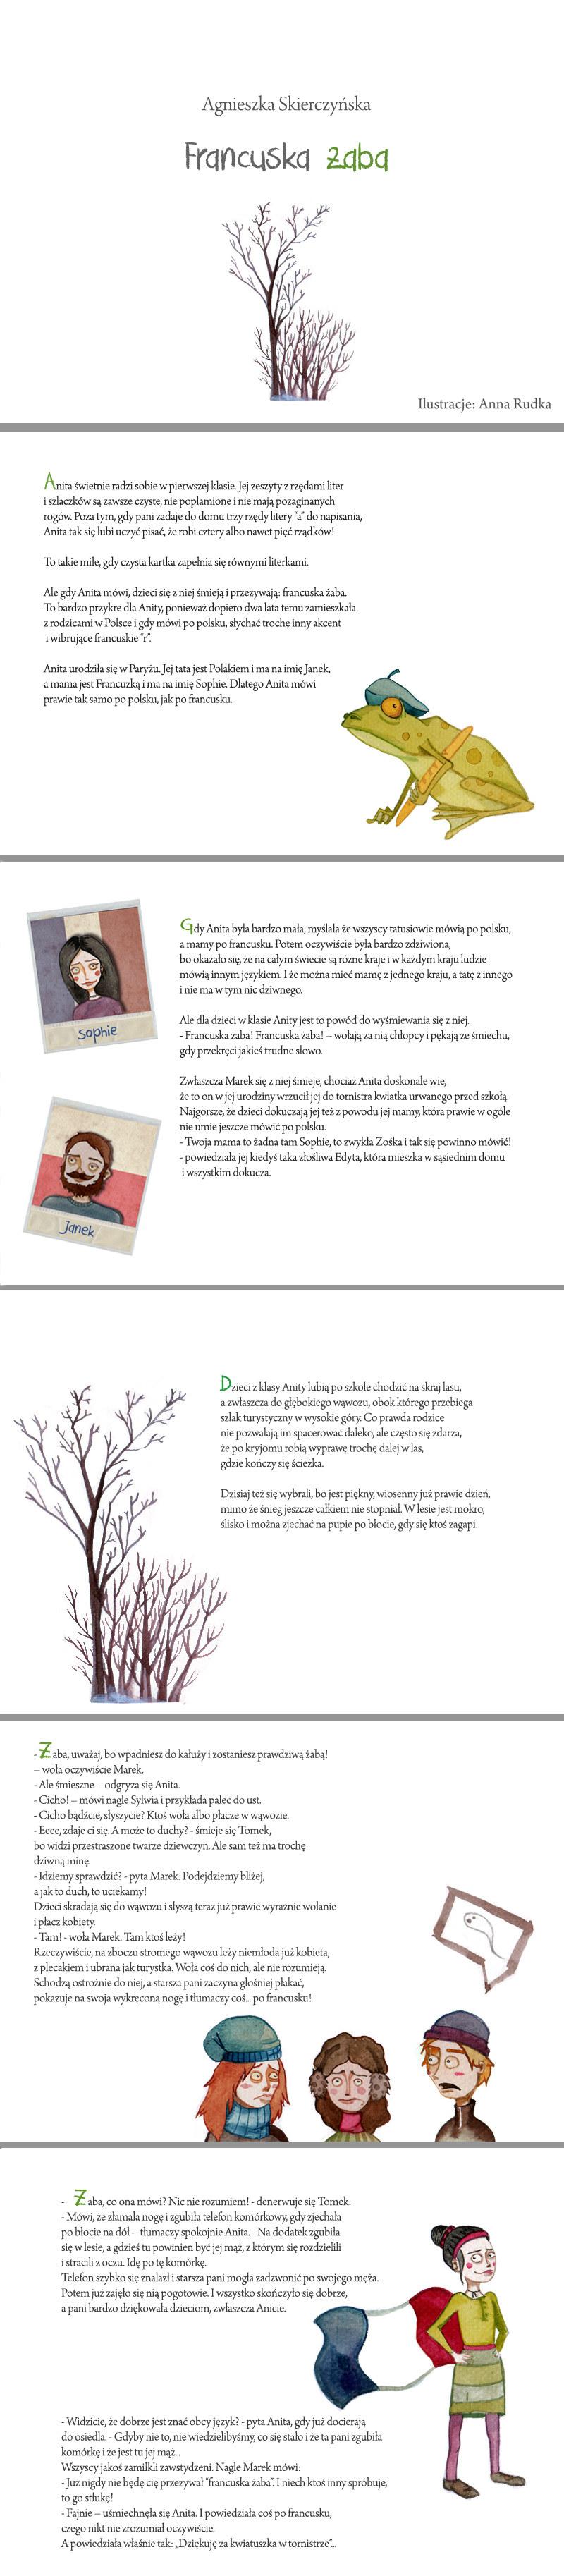 Francuska żaba - tekst Agnieszka Skierczyńska, ilustracje Anna Rudka /INTERIA.PL